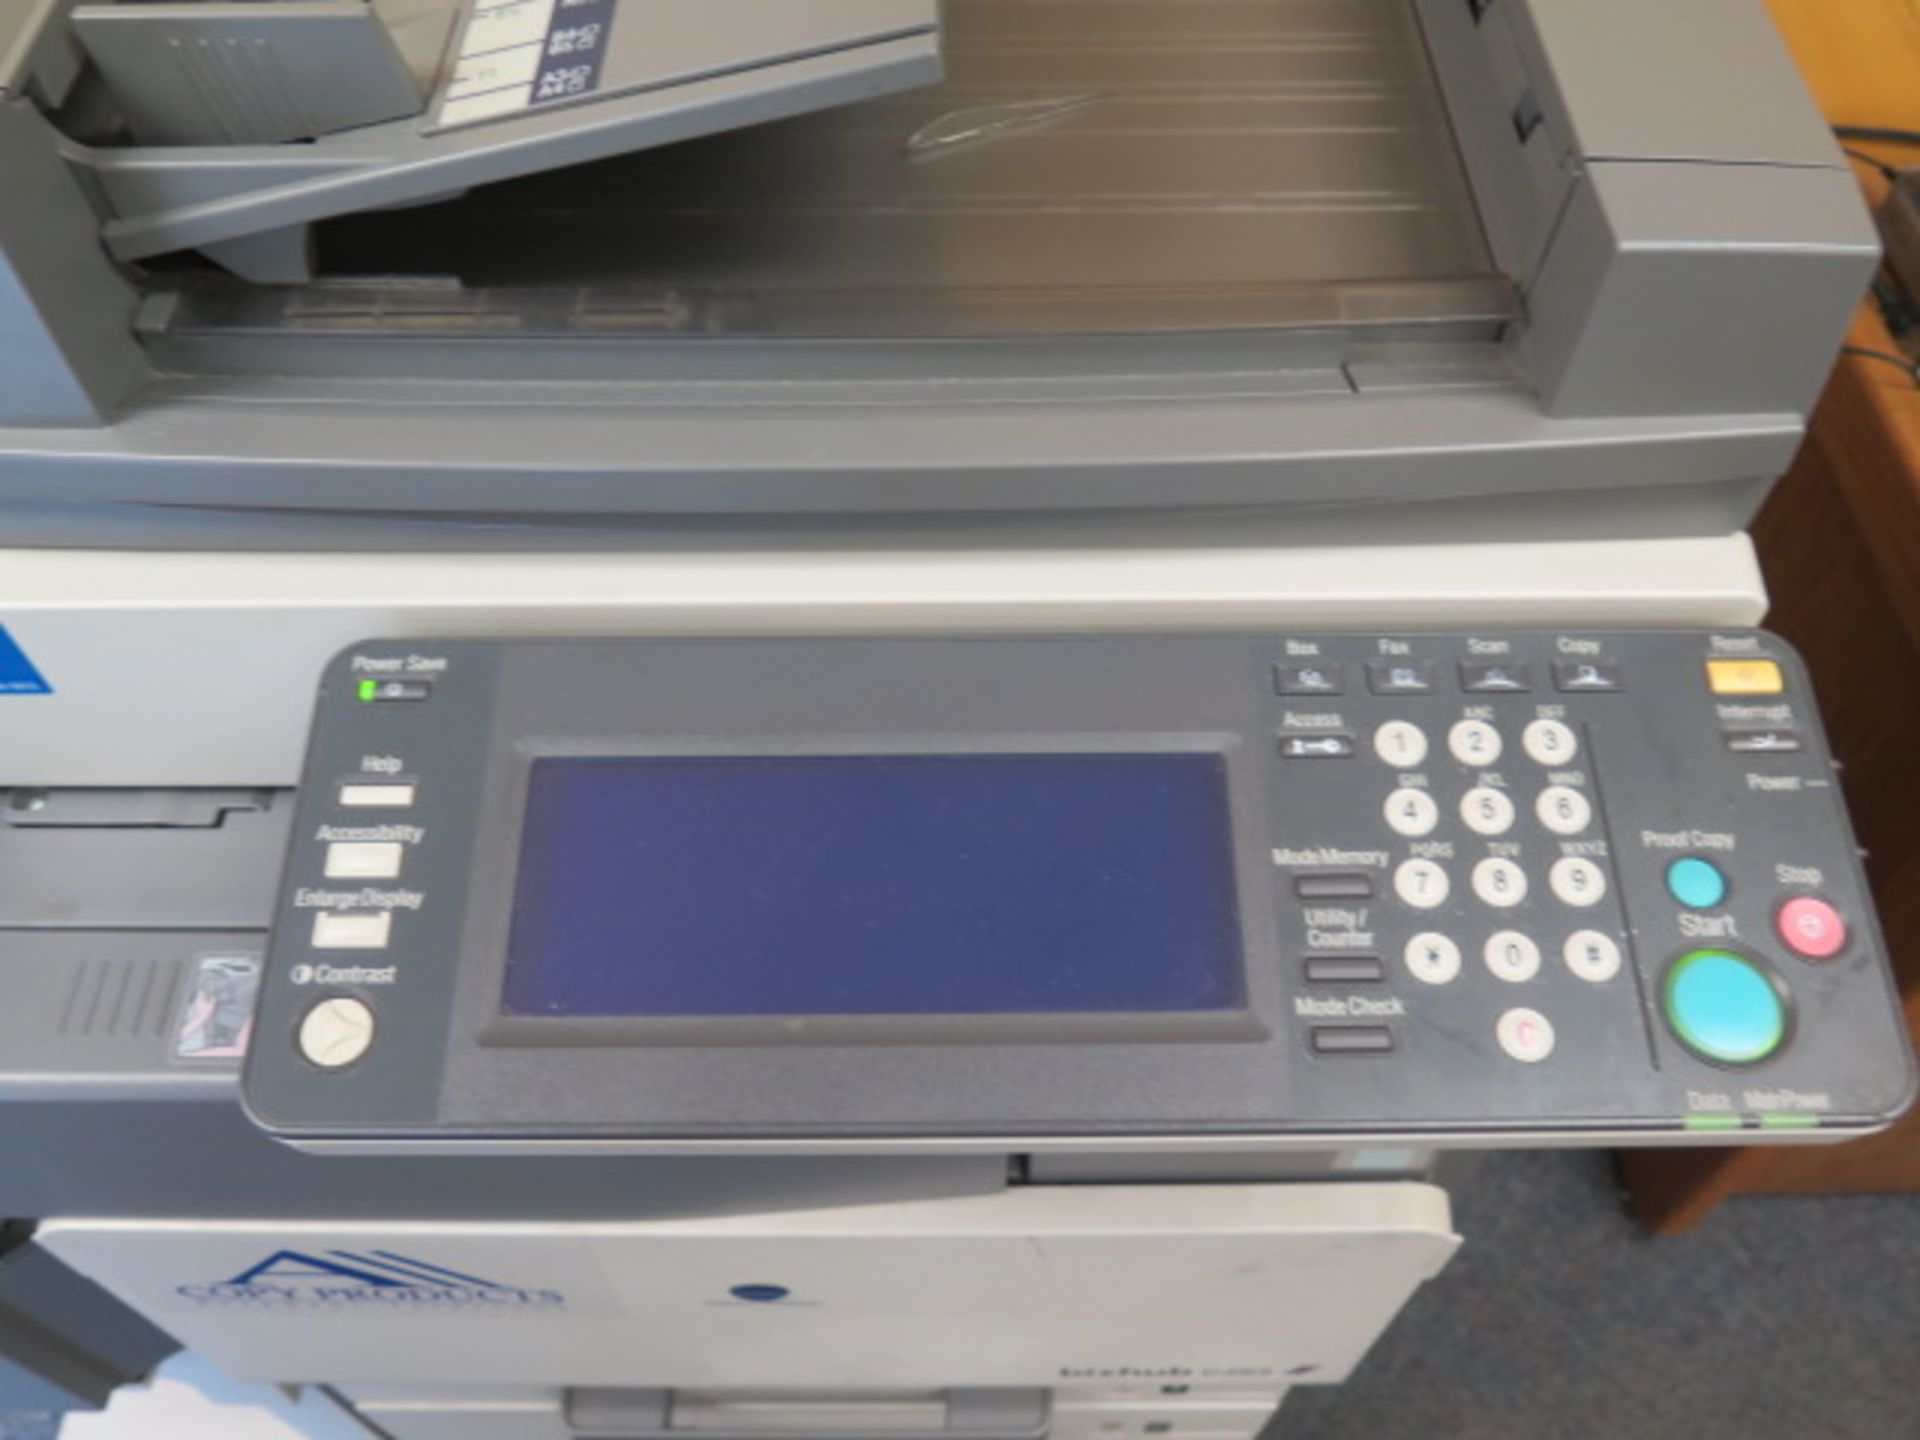 Konica Minolta bizhub C252 Color Copy Machine - Image 5 of 5